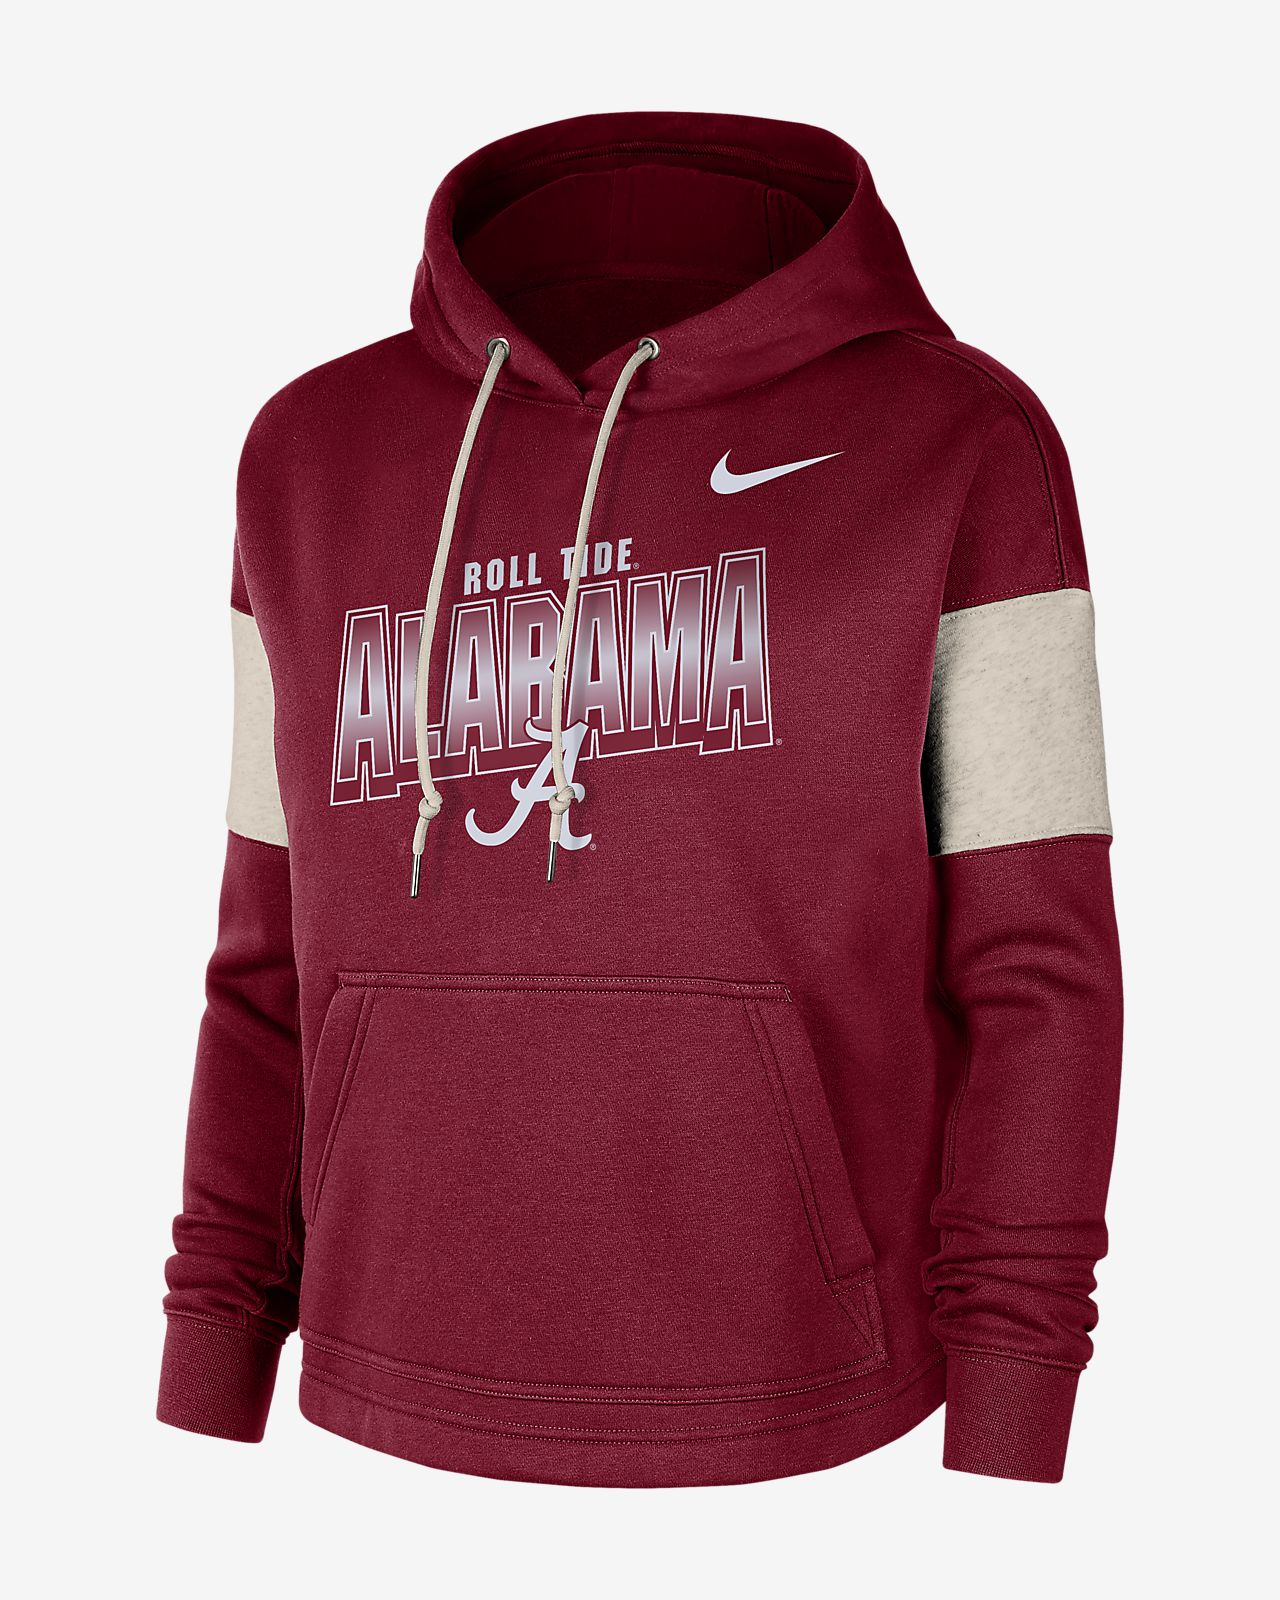 Nike College (Alabama) Women's Pullover Hoodie